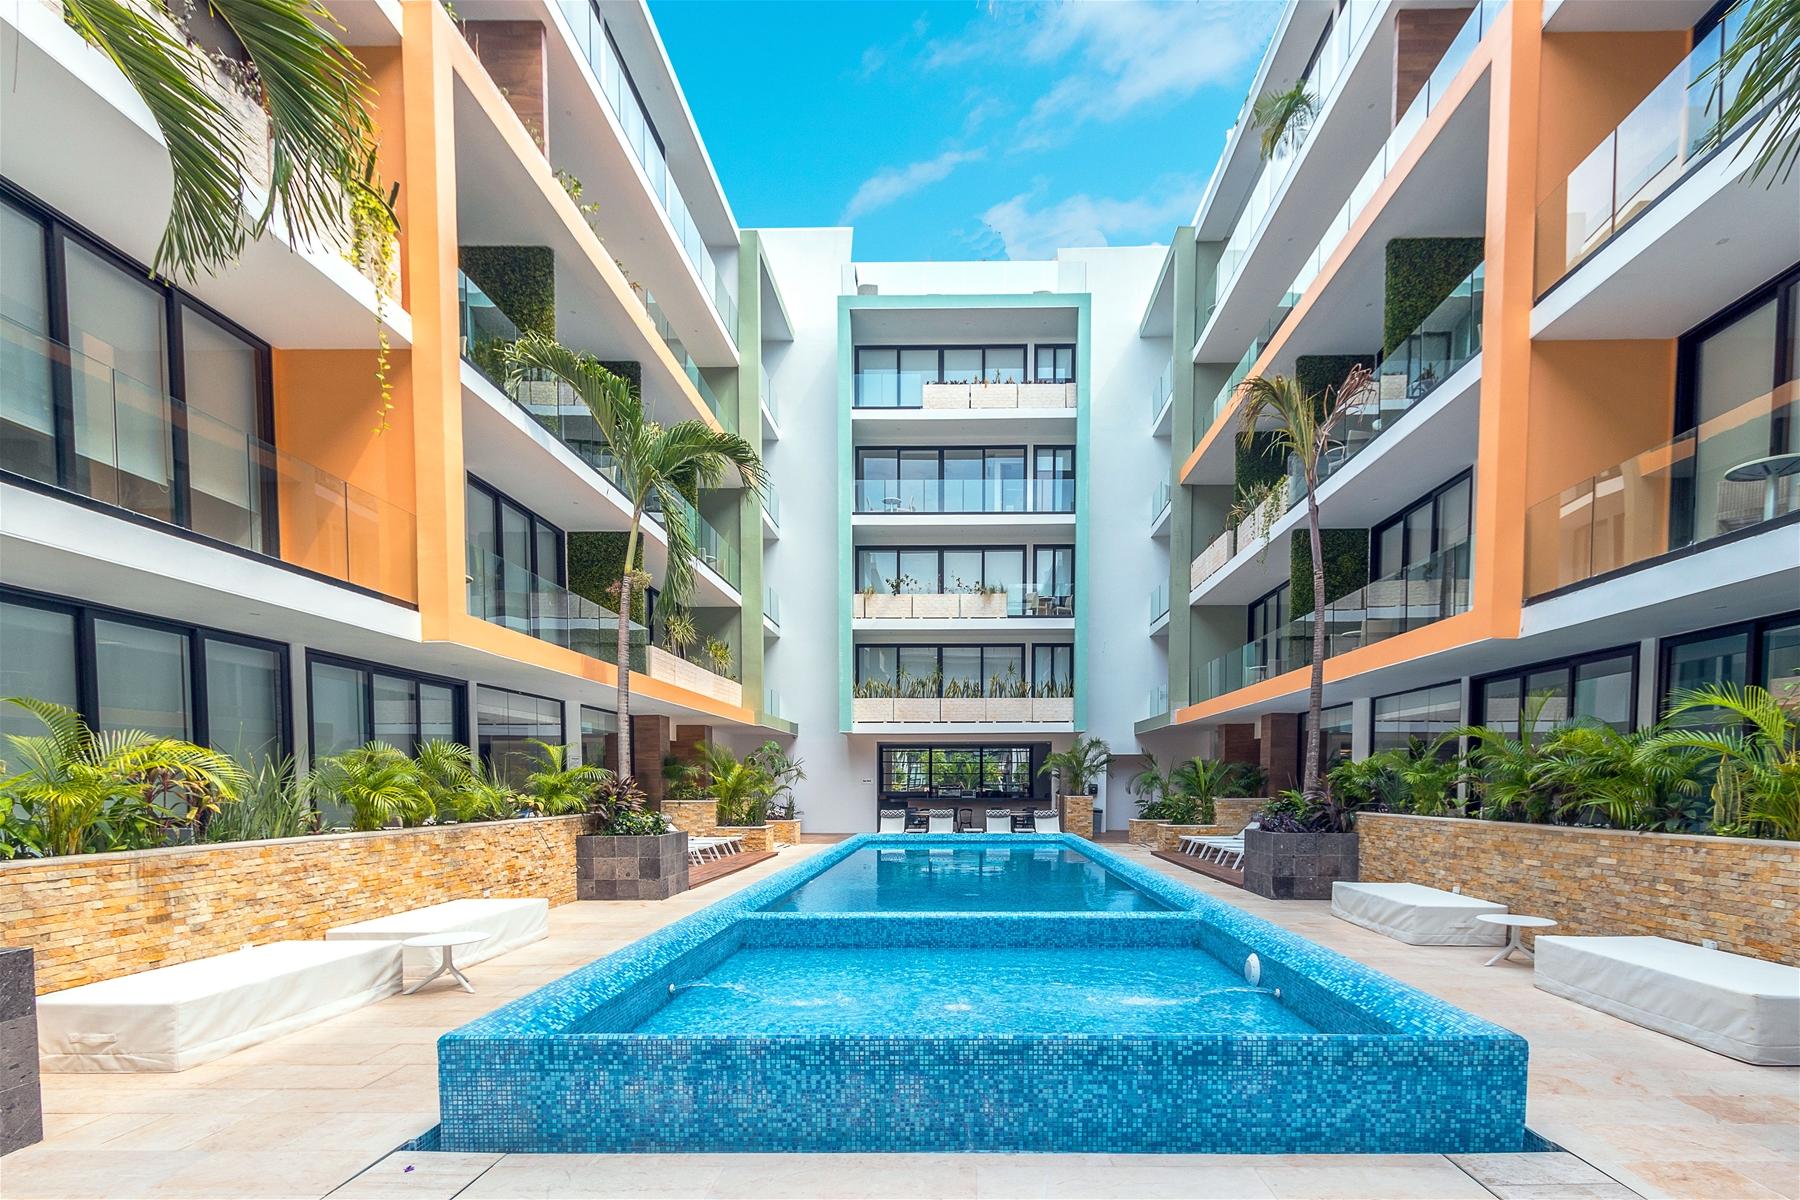 Menesse the City Condo Playa del Carmen Condo Home For Sale Real Estate to Buy